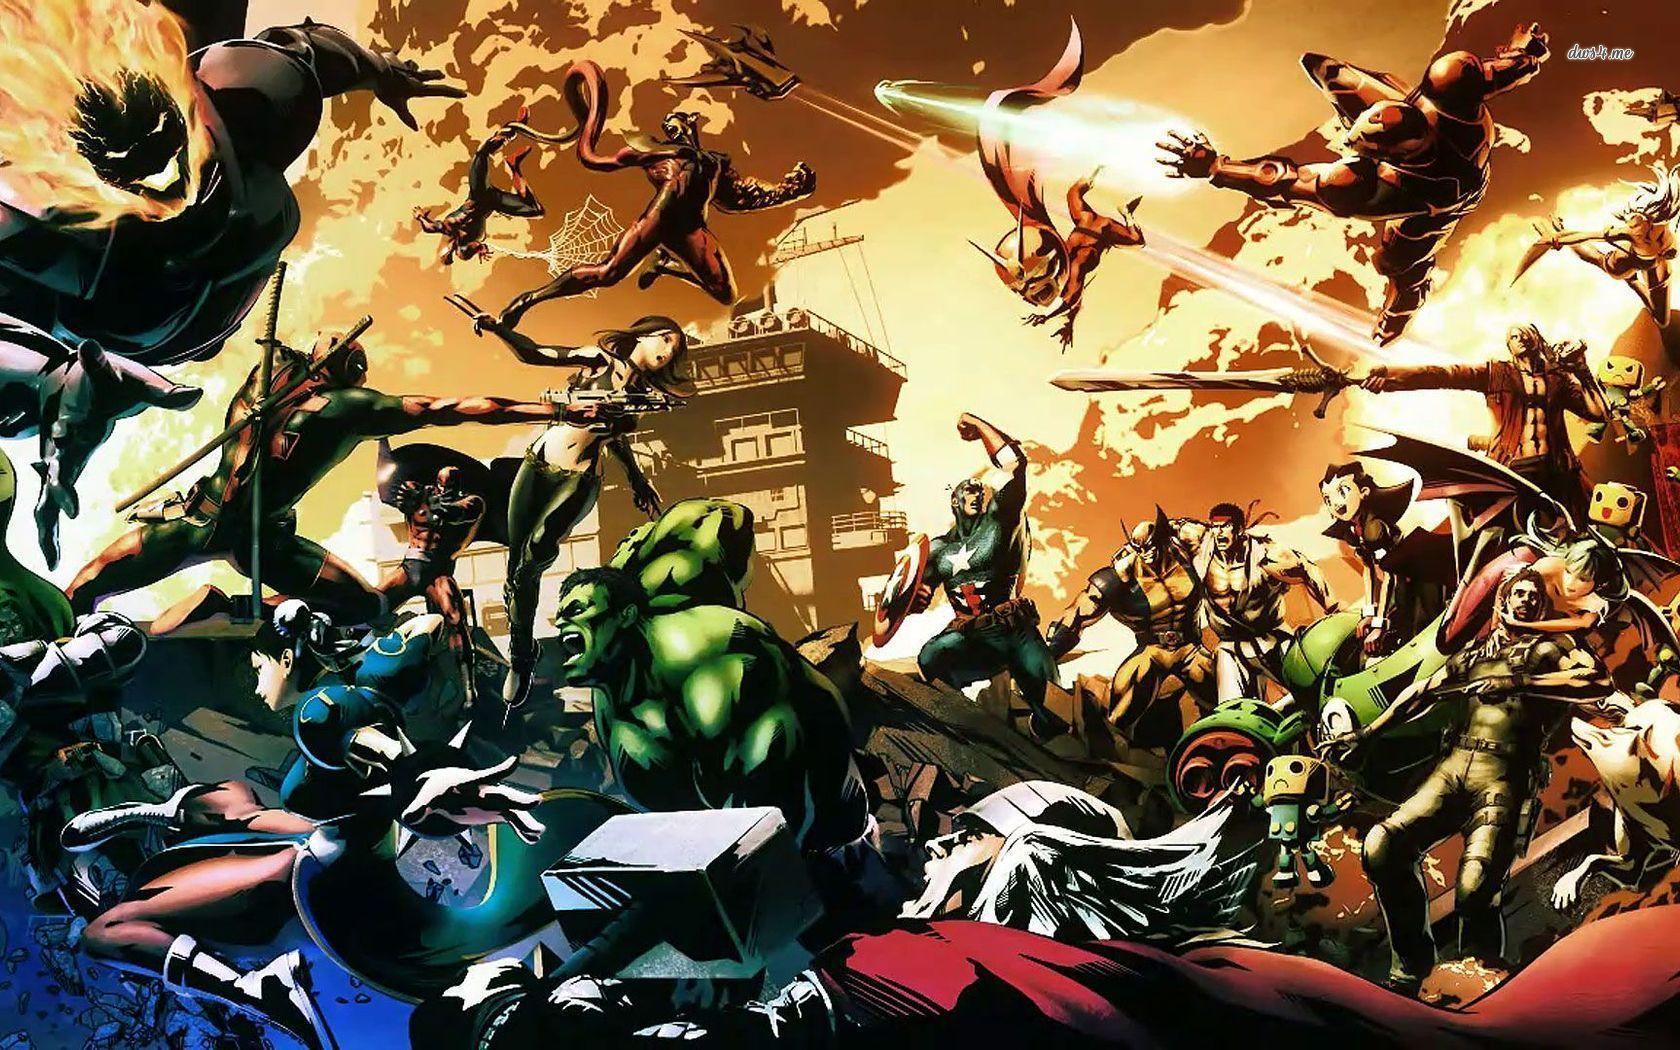 Ultimate Marvel Vs Capcom 3 Wallpapers Wallpaper Cave